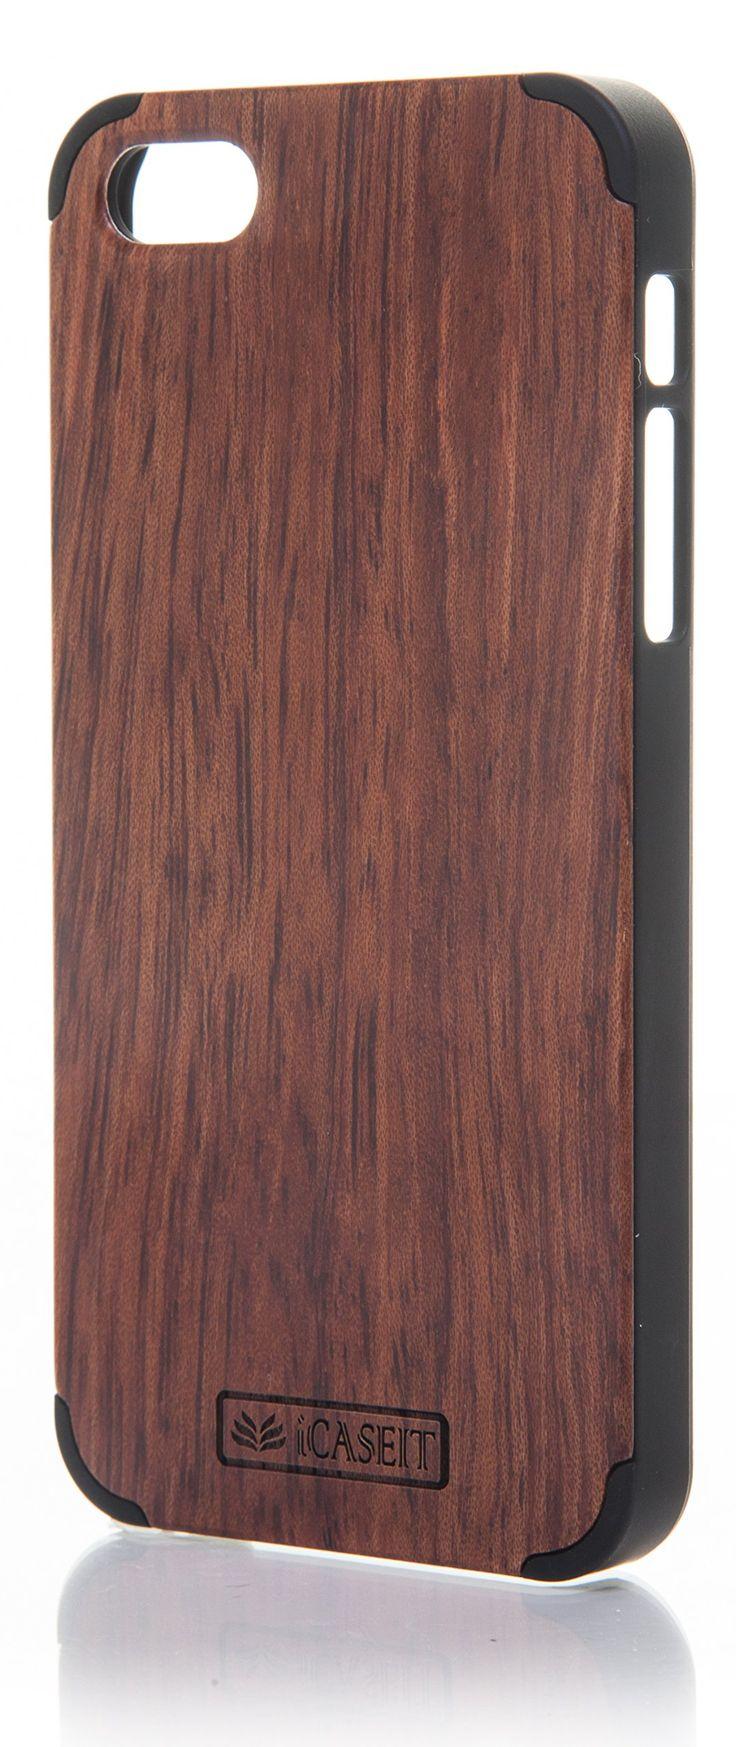 iCASEIT Wood iPhone Case - Genuinely Natural, Unique & Premium quality for iPhone 5 / 5S - Rosewood / Black